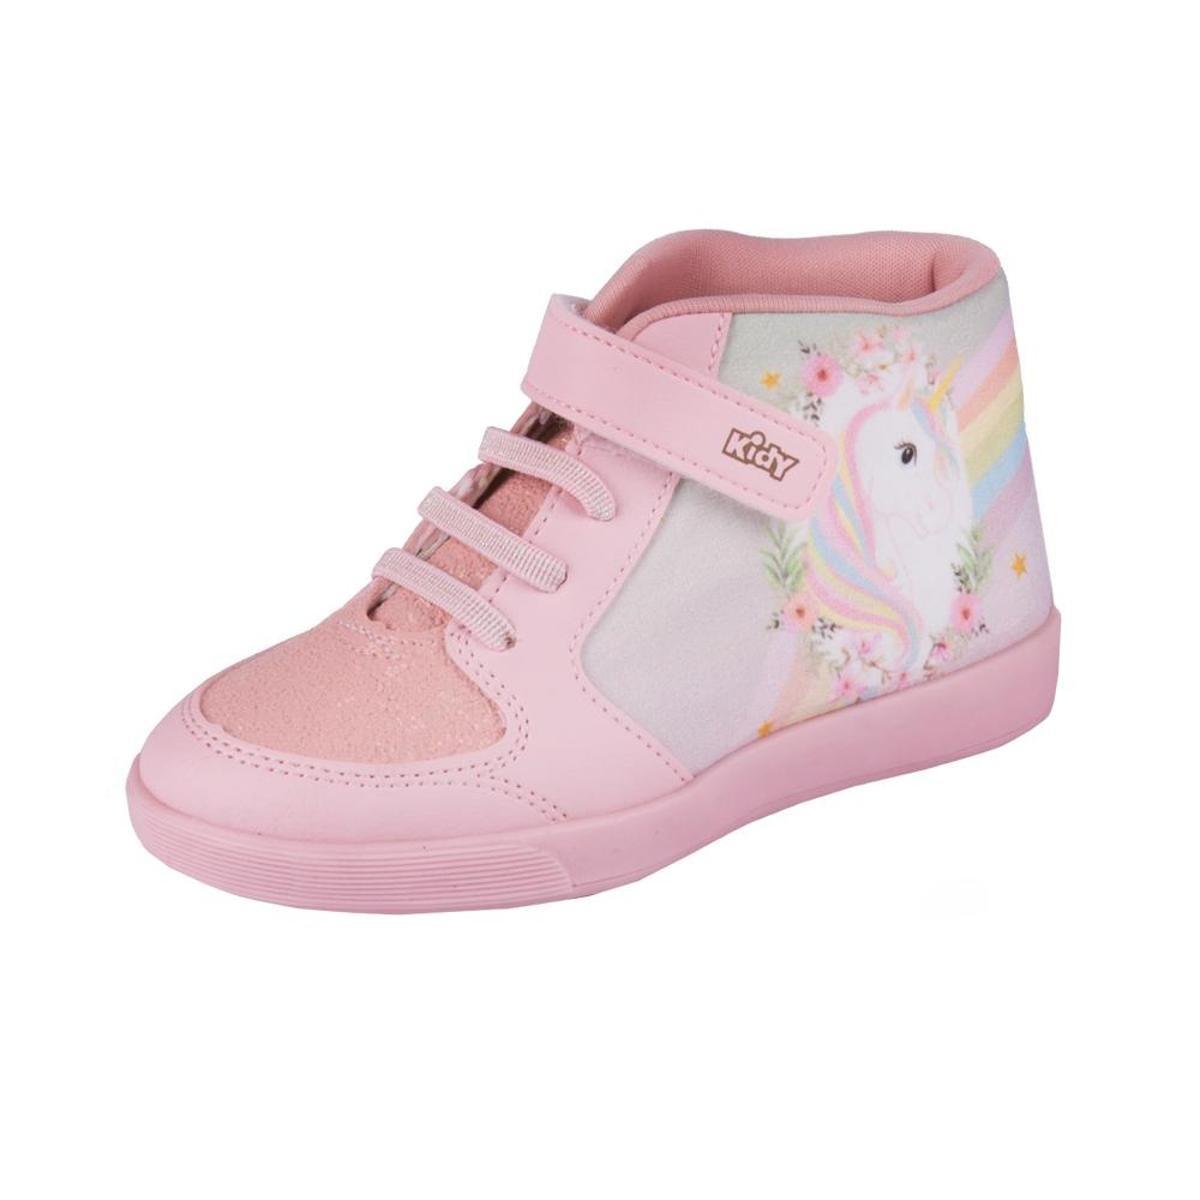 dc3addee2f5 Tênis Infantil Kidy Unicornio Love Feminino - Rosa - Compre Agora ...